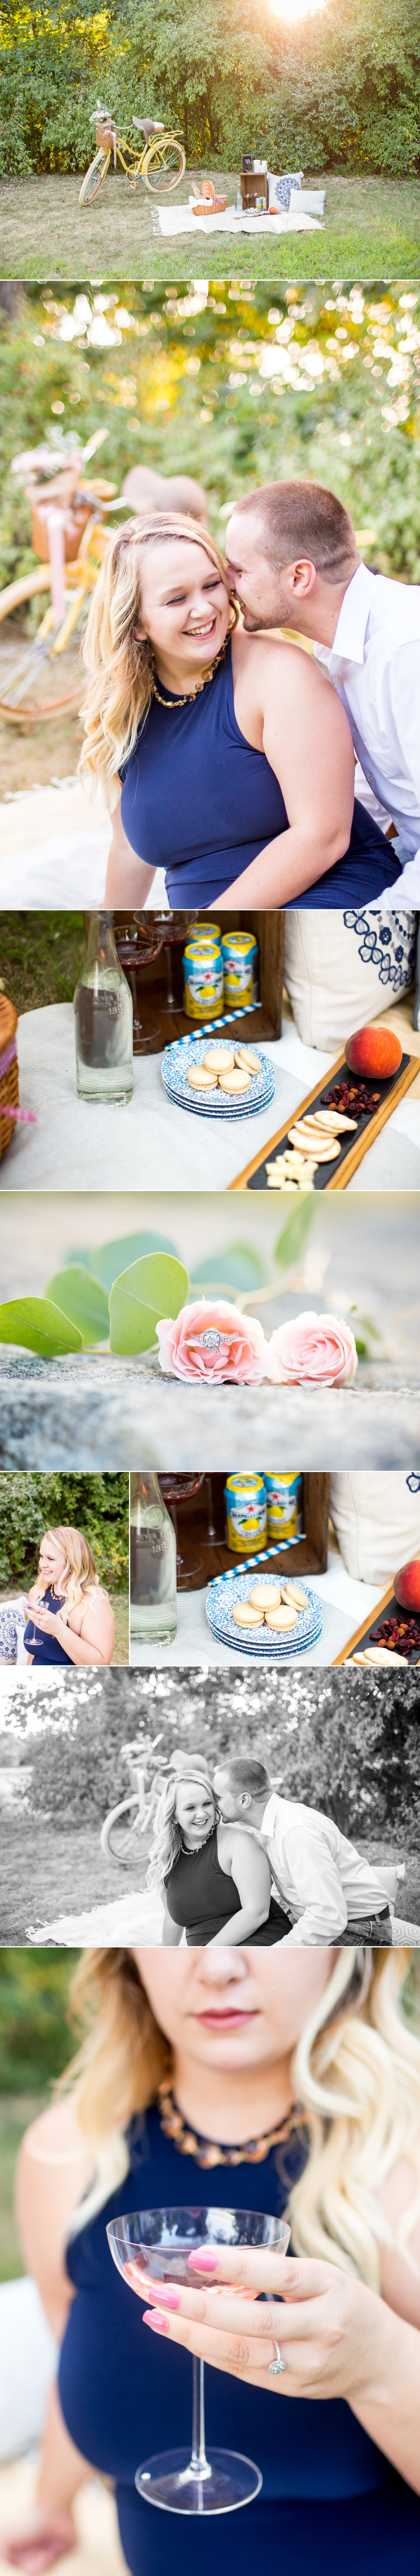 Rowayton, CT Summer Engagement Session Featured on Reverie Gallery | CT, NYC + Destination Luxury Wedding + Engagement Photographer | Shaina Lee Photography